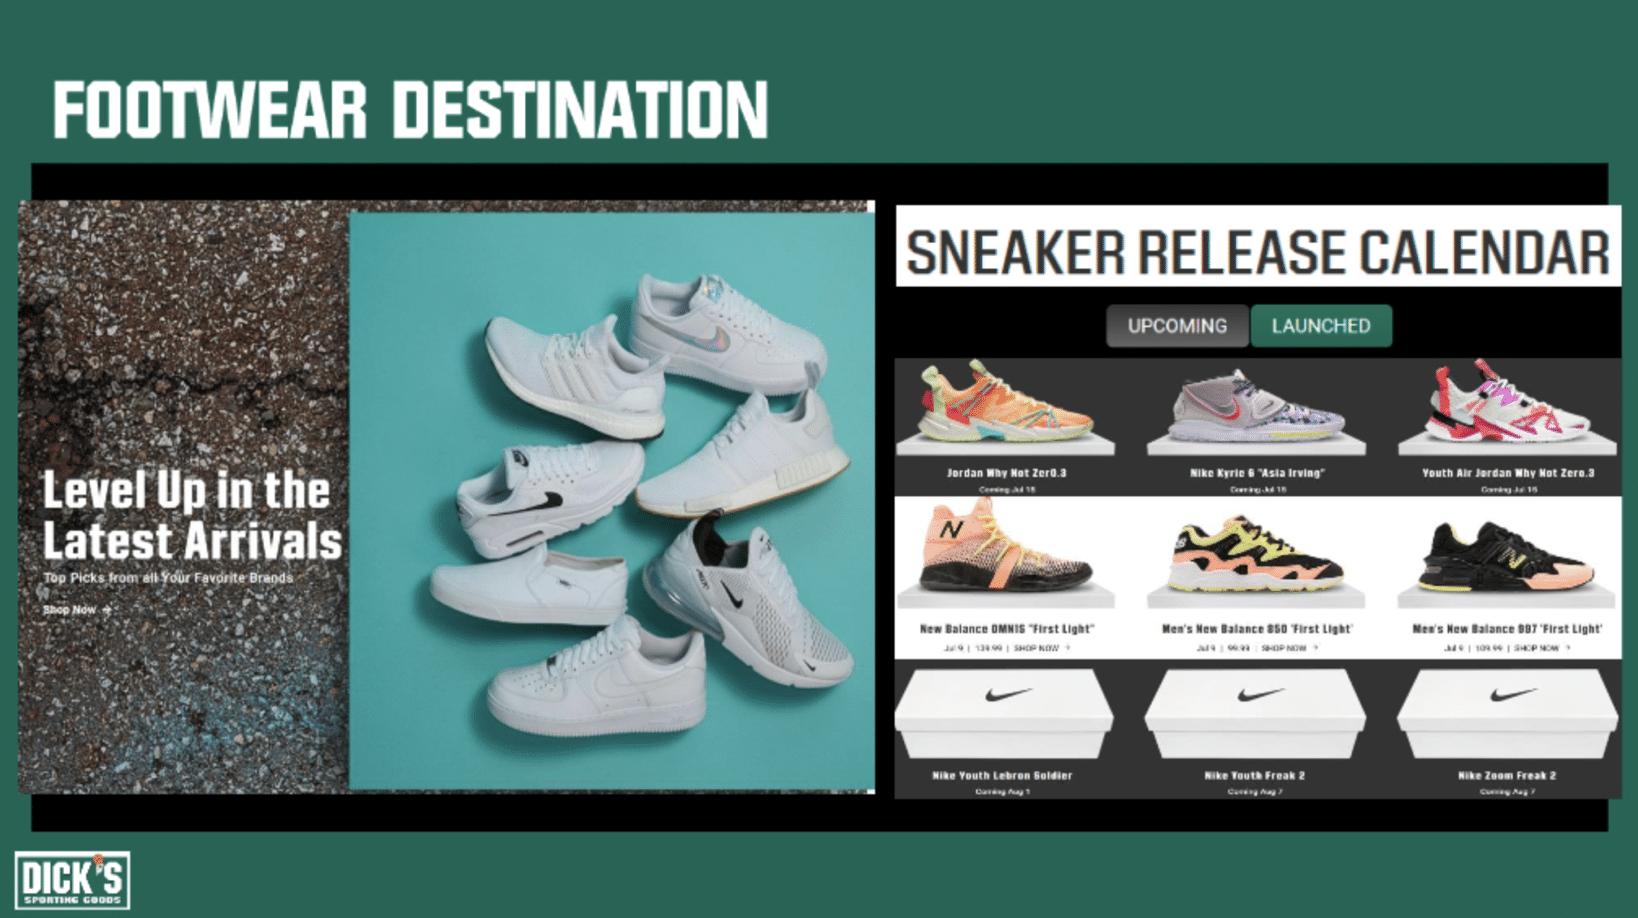 dick's sneaker release calendar